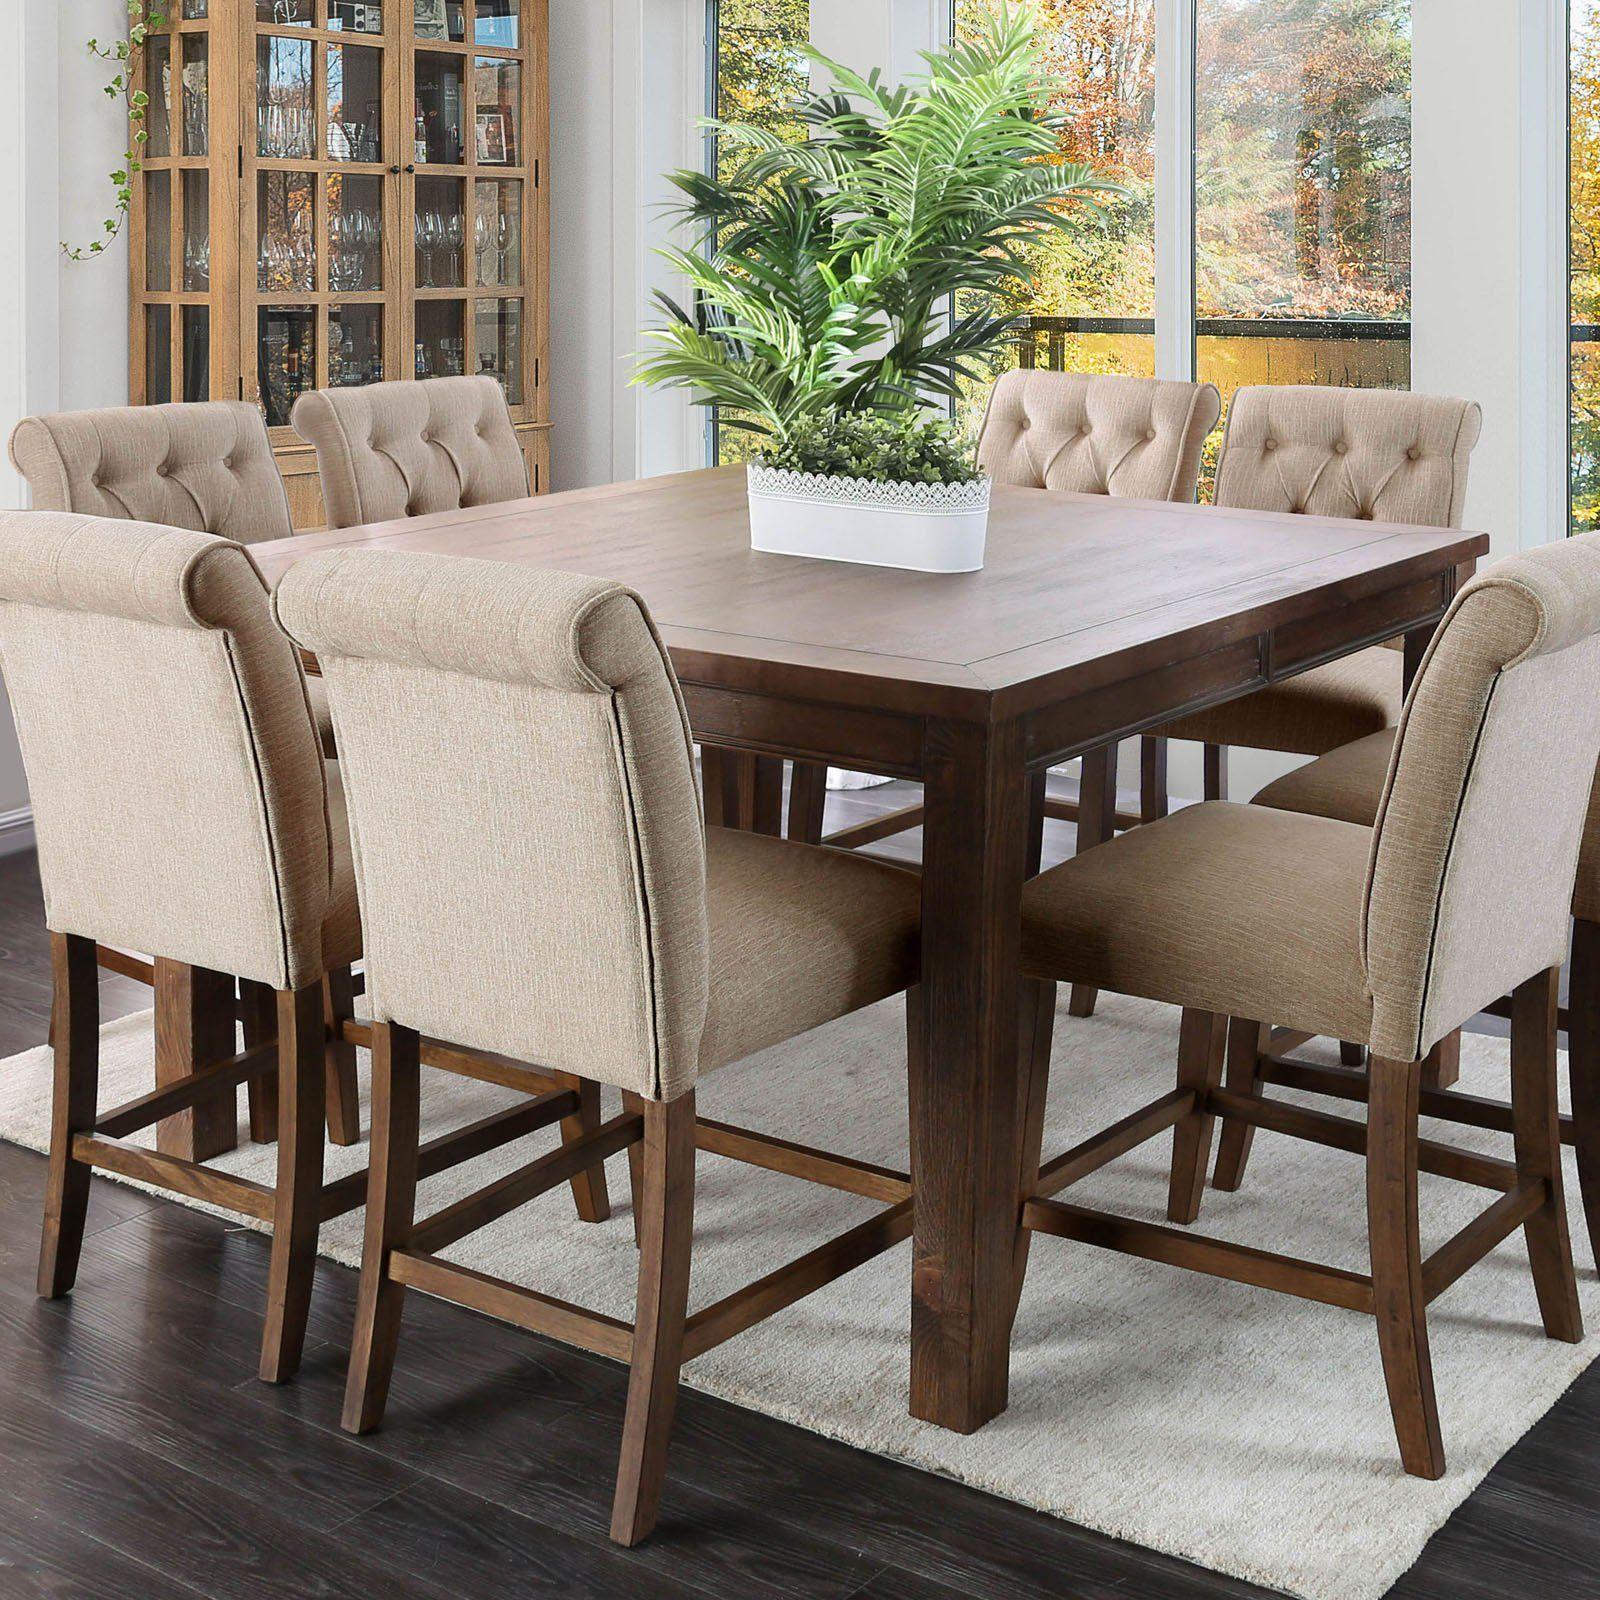 Furniture Of America Bennington 54 In Counter Height Dining Table In 2021 Counter Height Dining Table Dining Table Counter Height Dining Sets